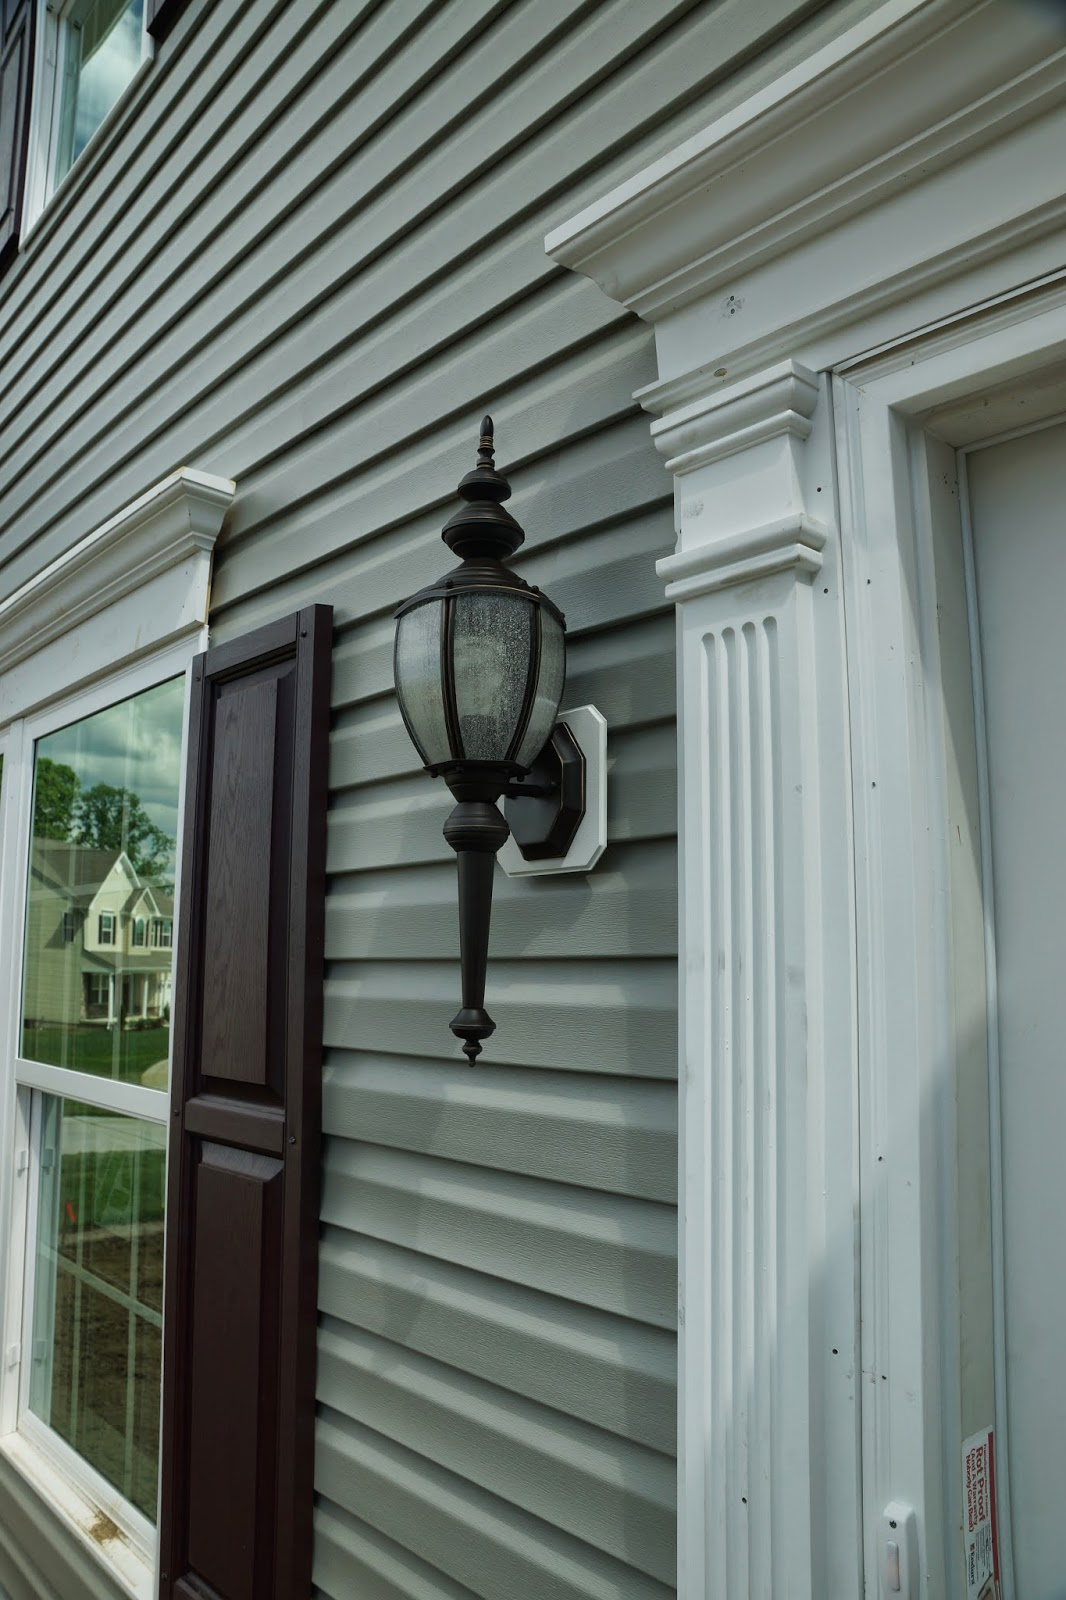 A picture of the front door light fixture.